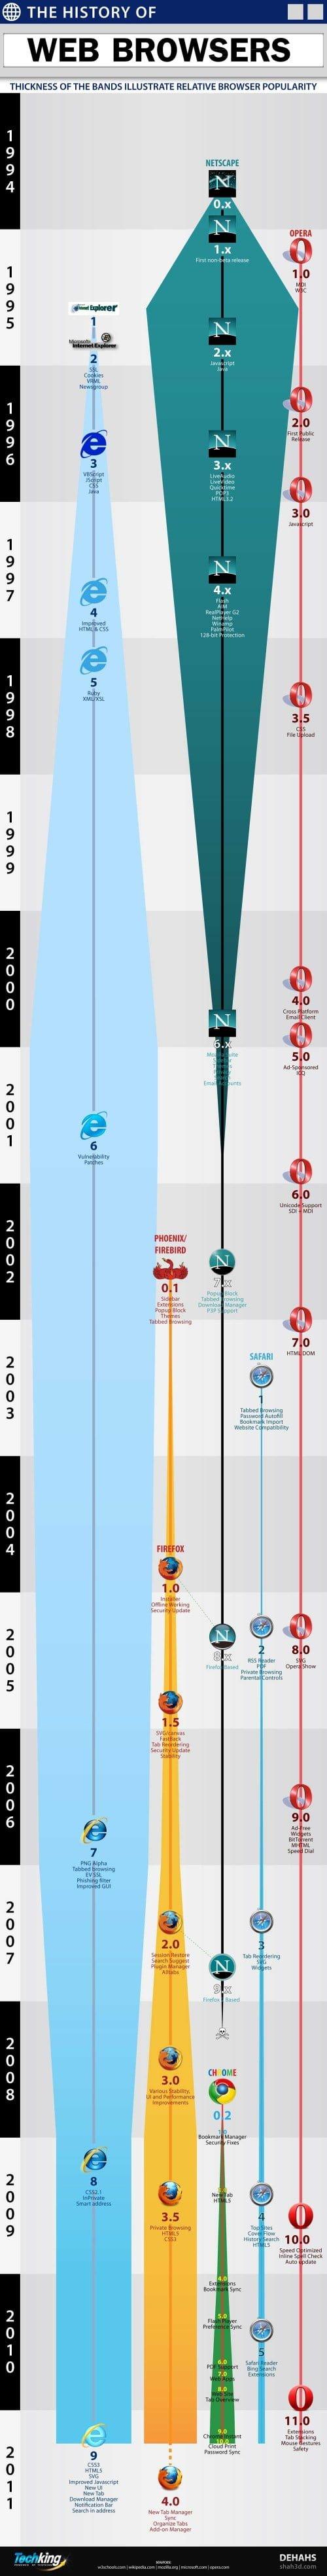 historia-navegadores-500x3937